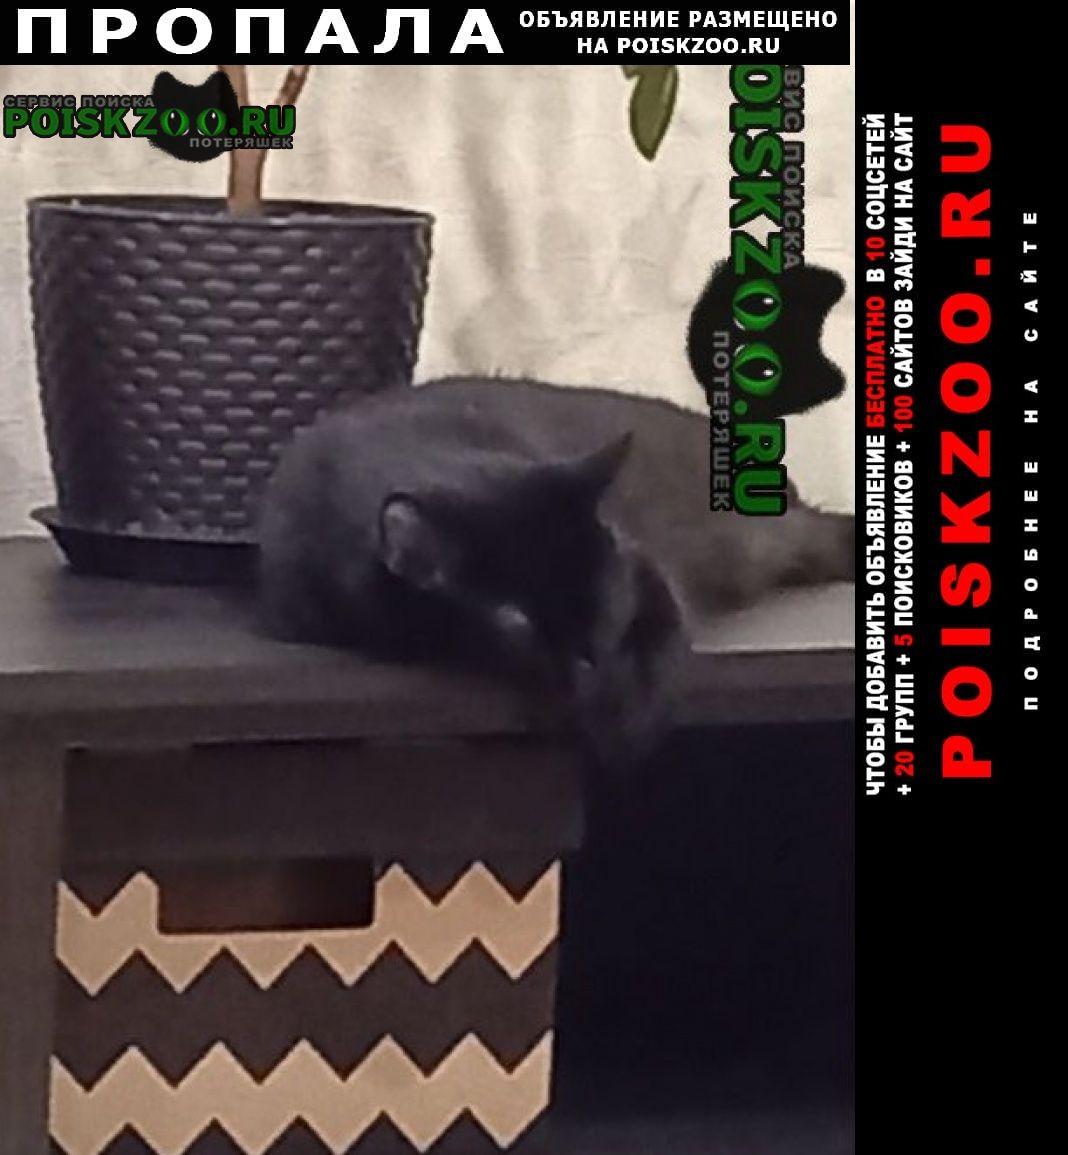 Пропала кошка Старый Оскол